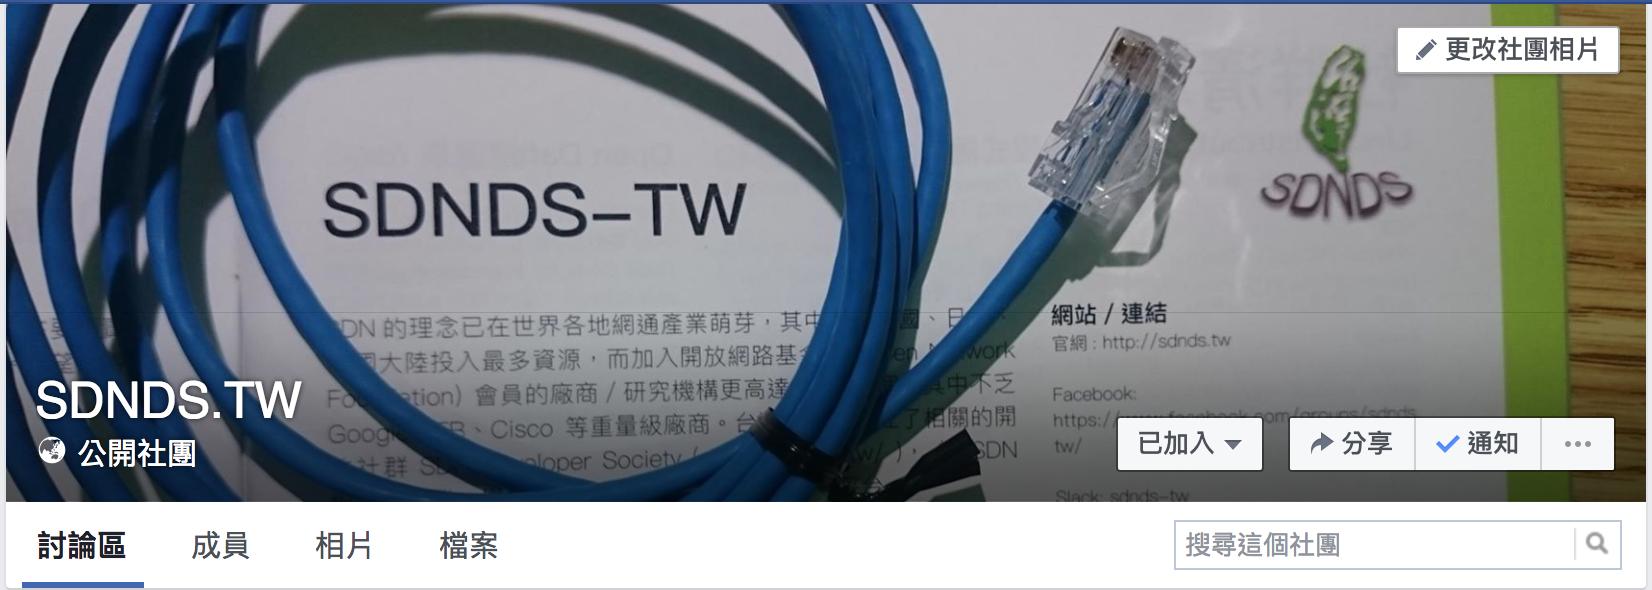 SDNDS-TW Facebook Group